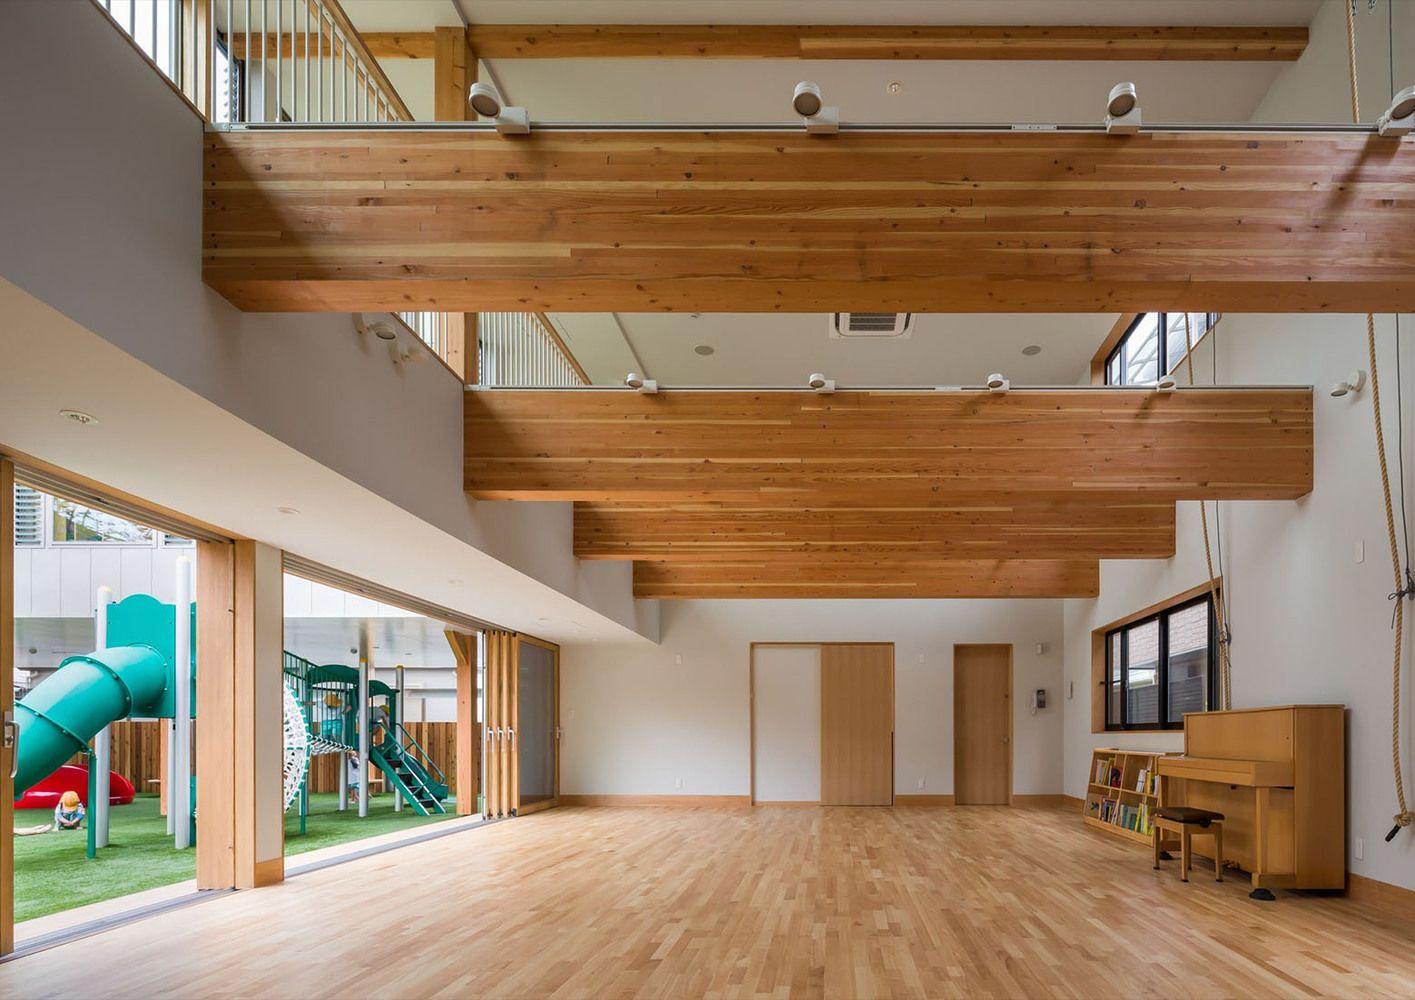 Galeria de Creche Infantil TAKENO / Tadashi Suga Architects - 4